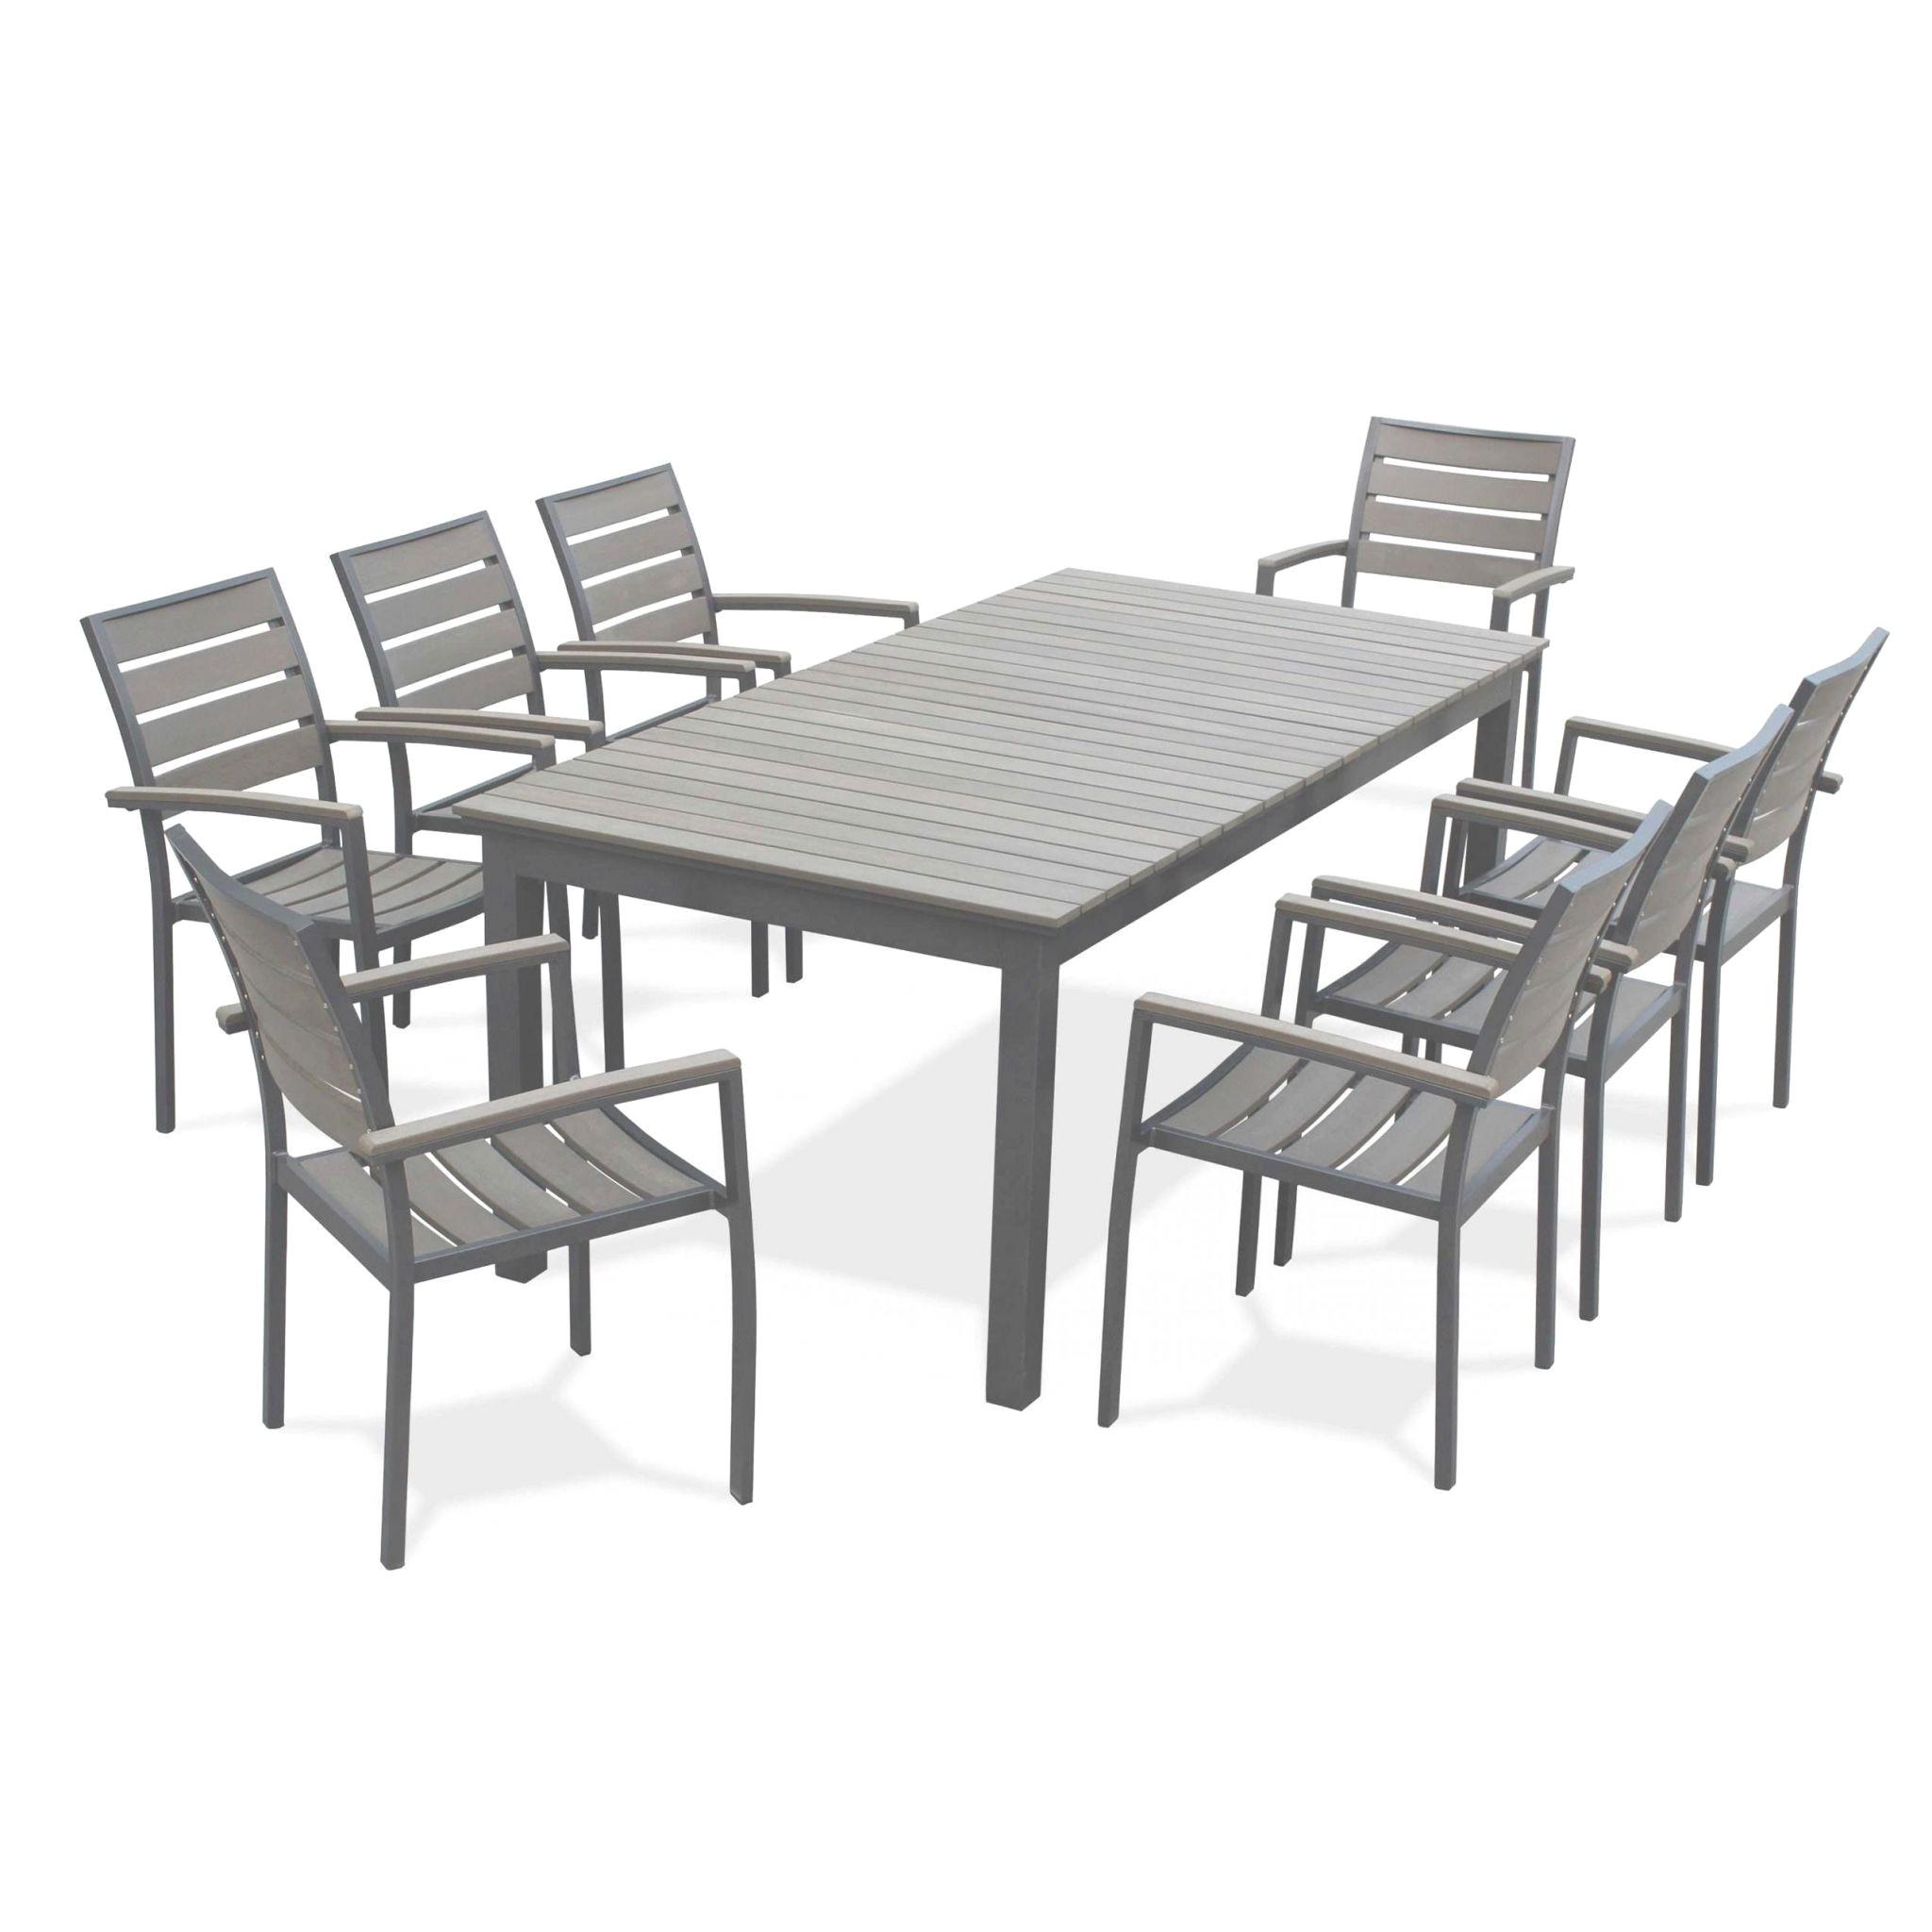 Table De Jardin En Fonte Perpignan Maison Design Trivid Us ... serapportantà Table De Jardin Kettler